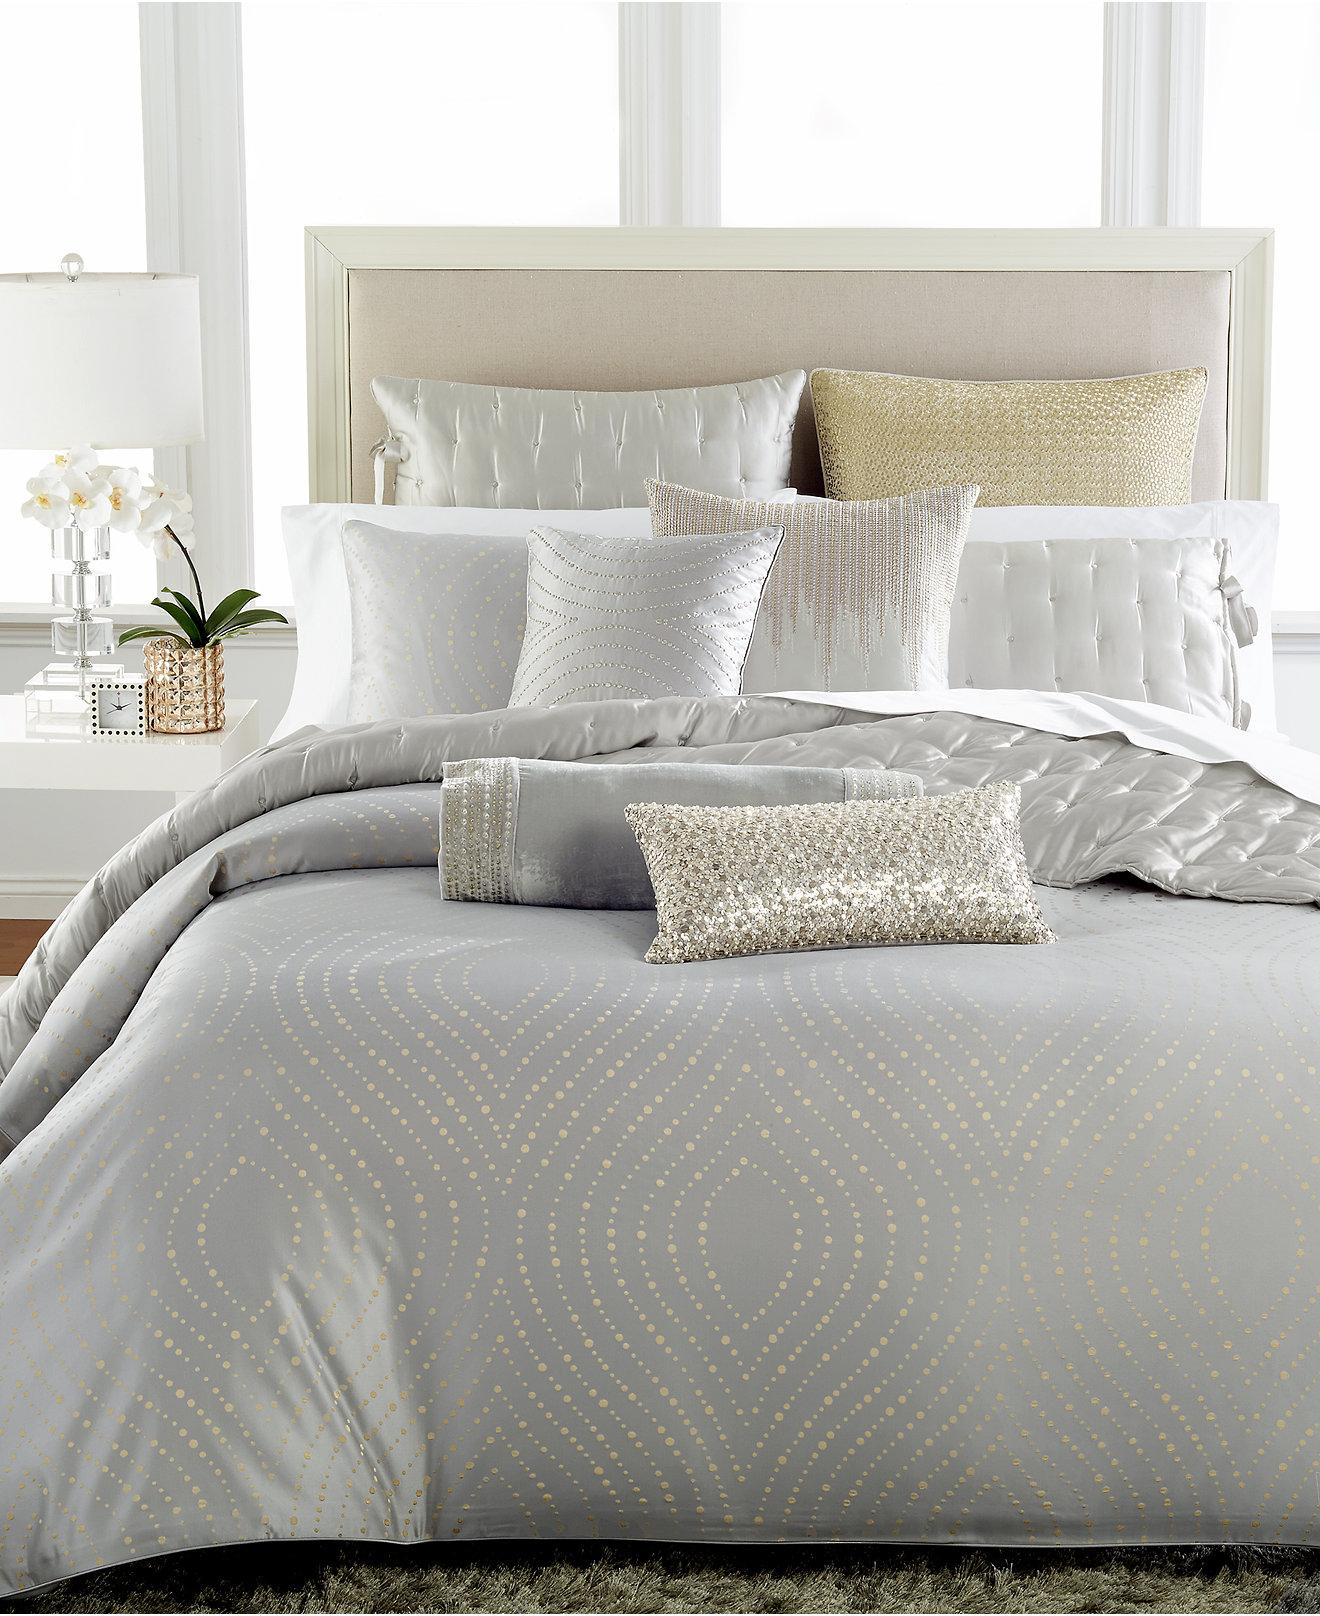 Silver Leaf Bedroom Furniture Hotel Collection Finest Silver Leaf Bedding Collection Only At